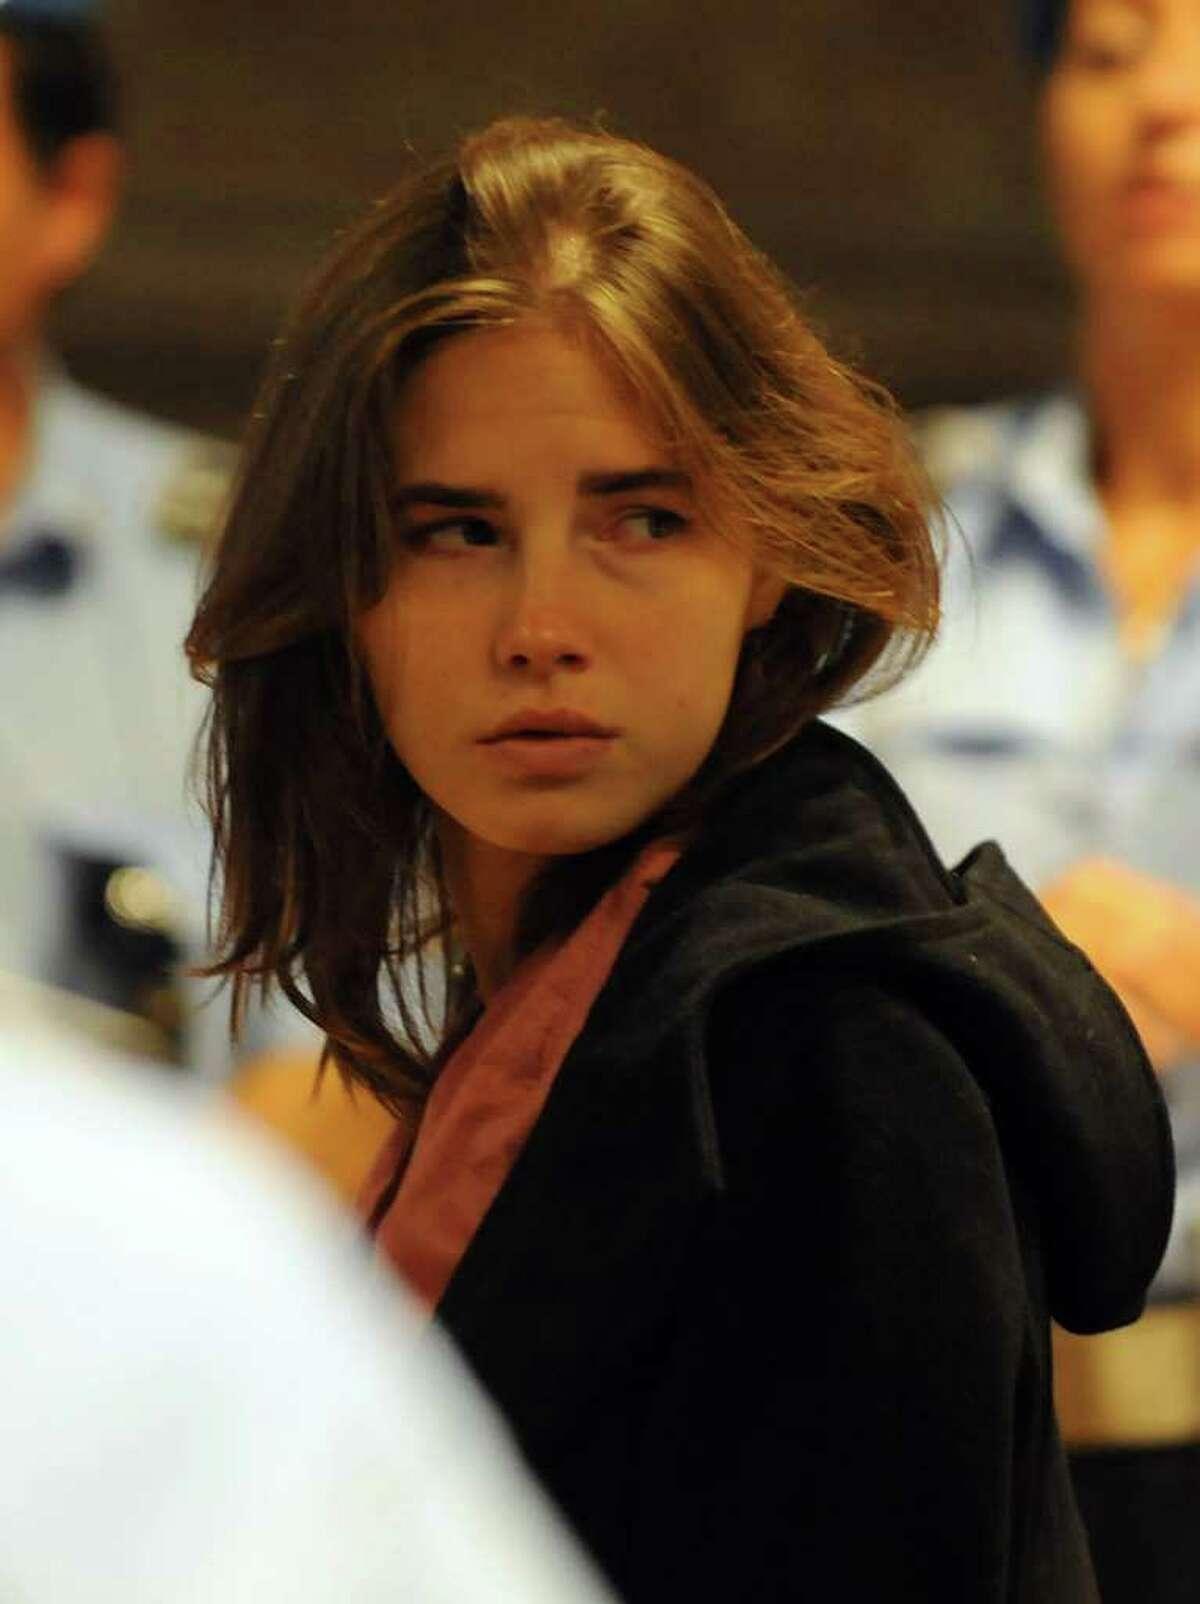 Amanda Knox is seen in court on Friday. AFP PHOTO/MARIO LAPORTA